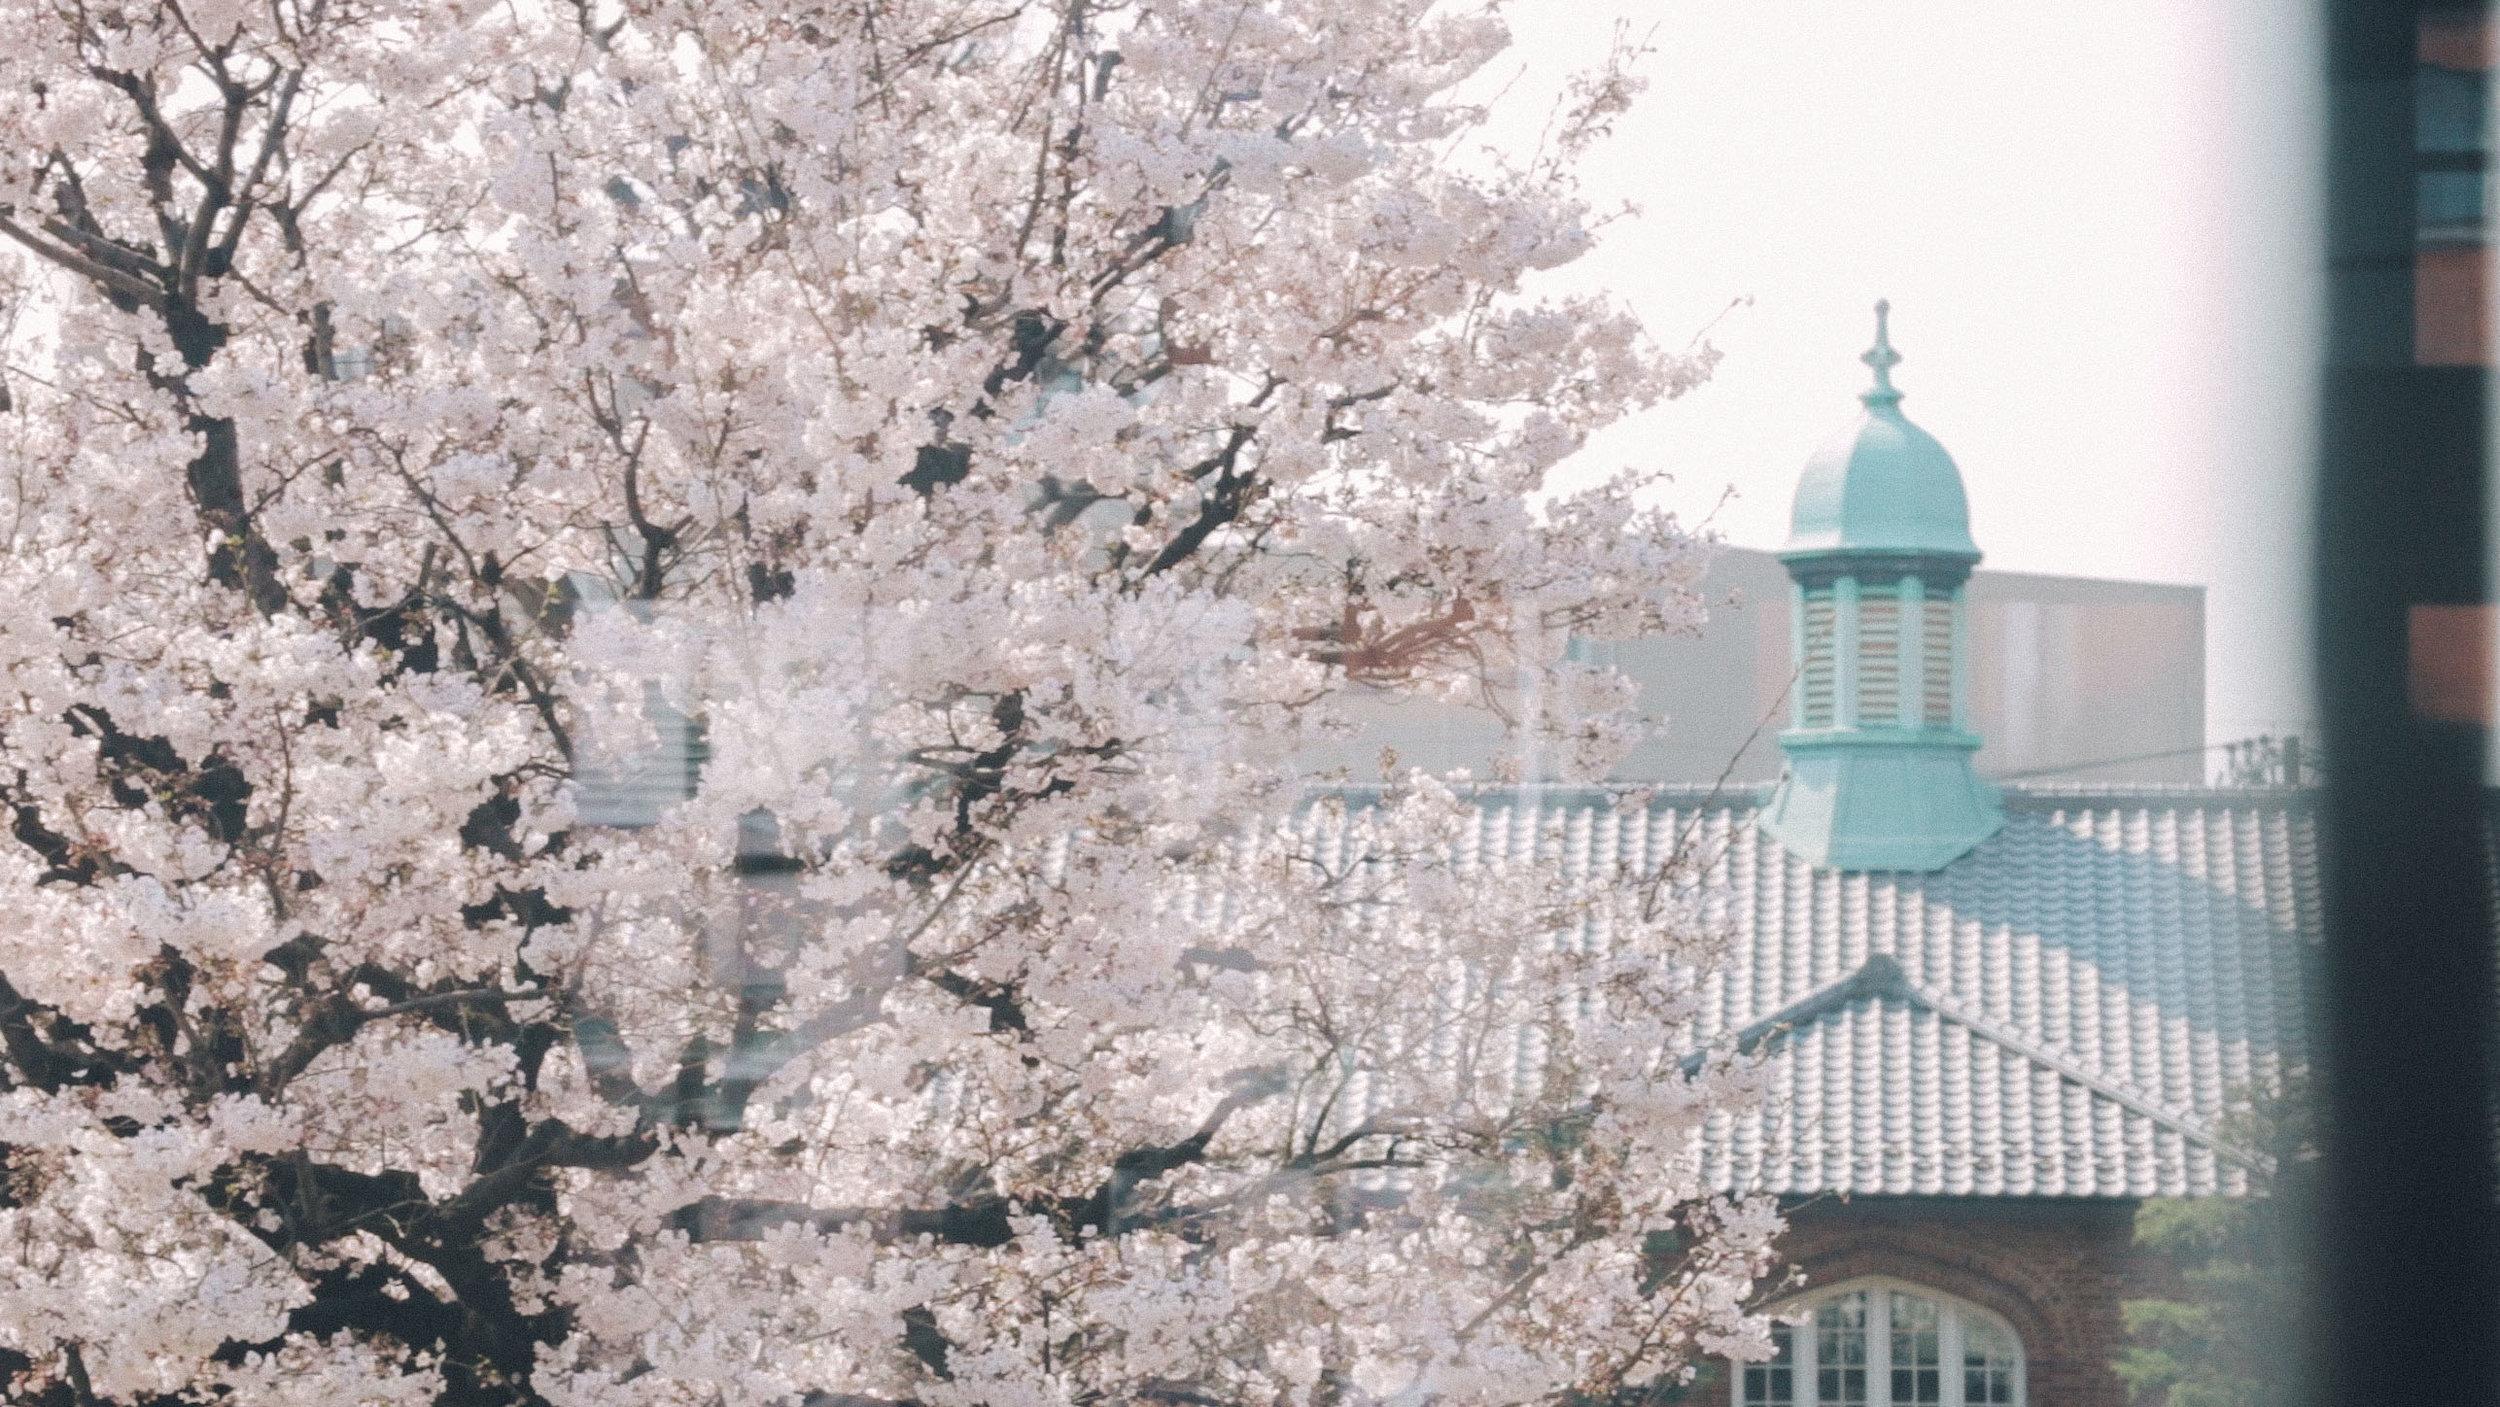 Rikkyo_Spring_th1_2.jpg